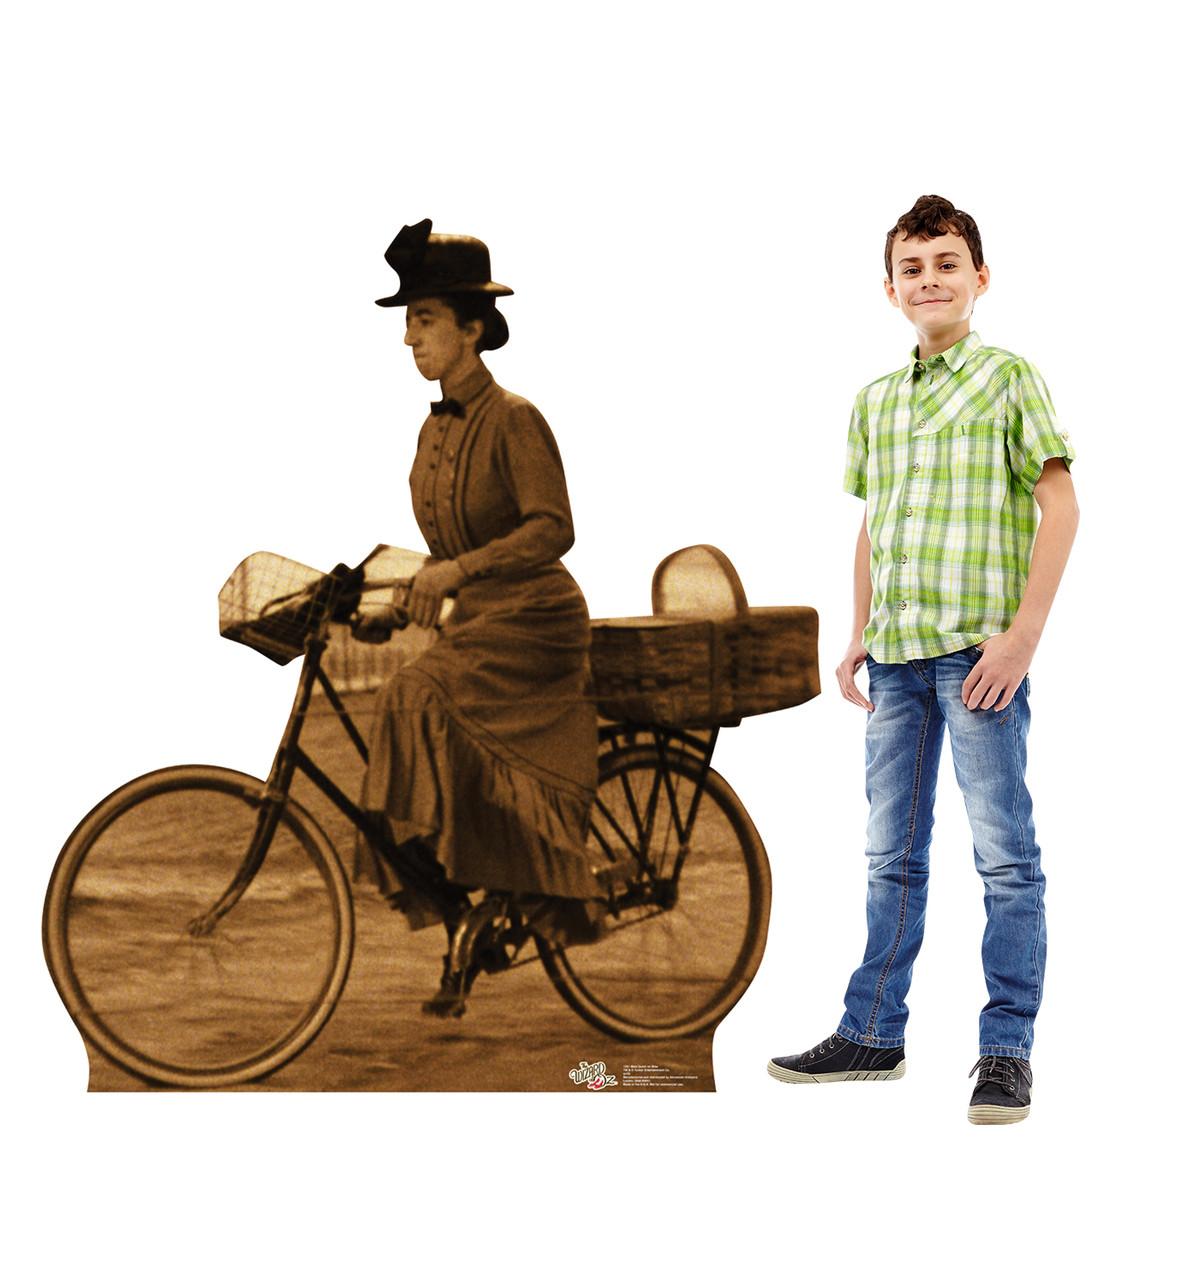 Life-size Miss Gulch on Bike - Wizard of Oz Cardboard Standup next to child